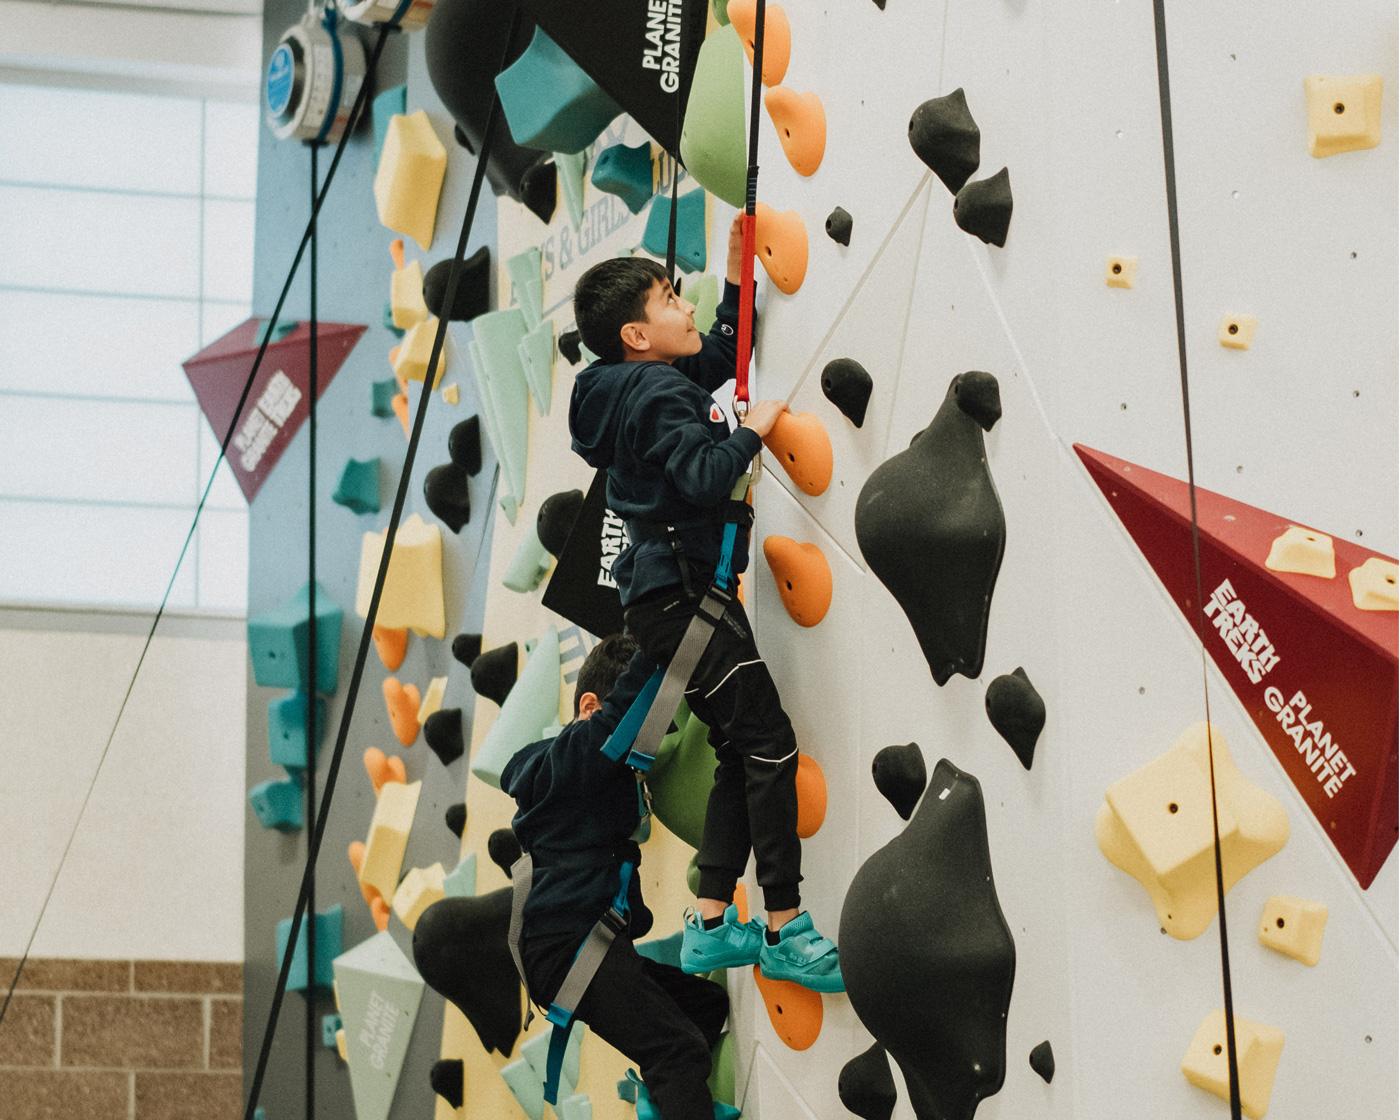 A boys and girls club member climbing up the new Denver 1Climb wall